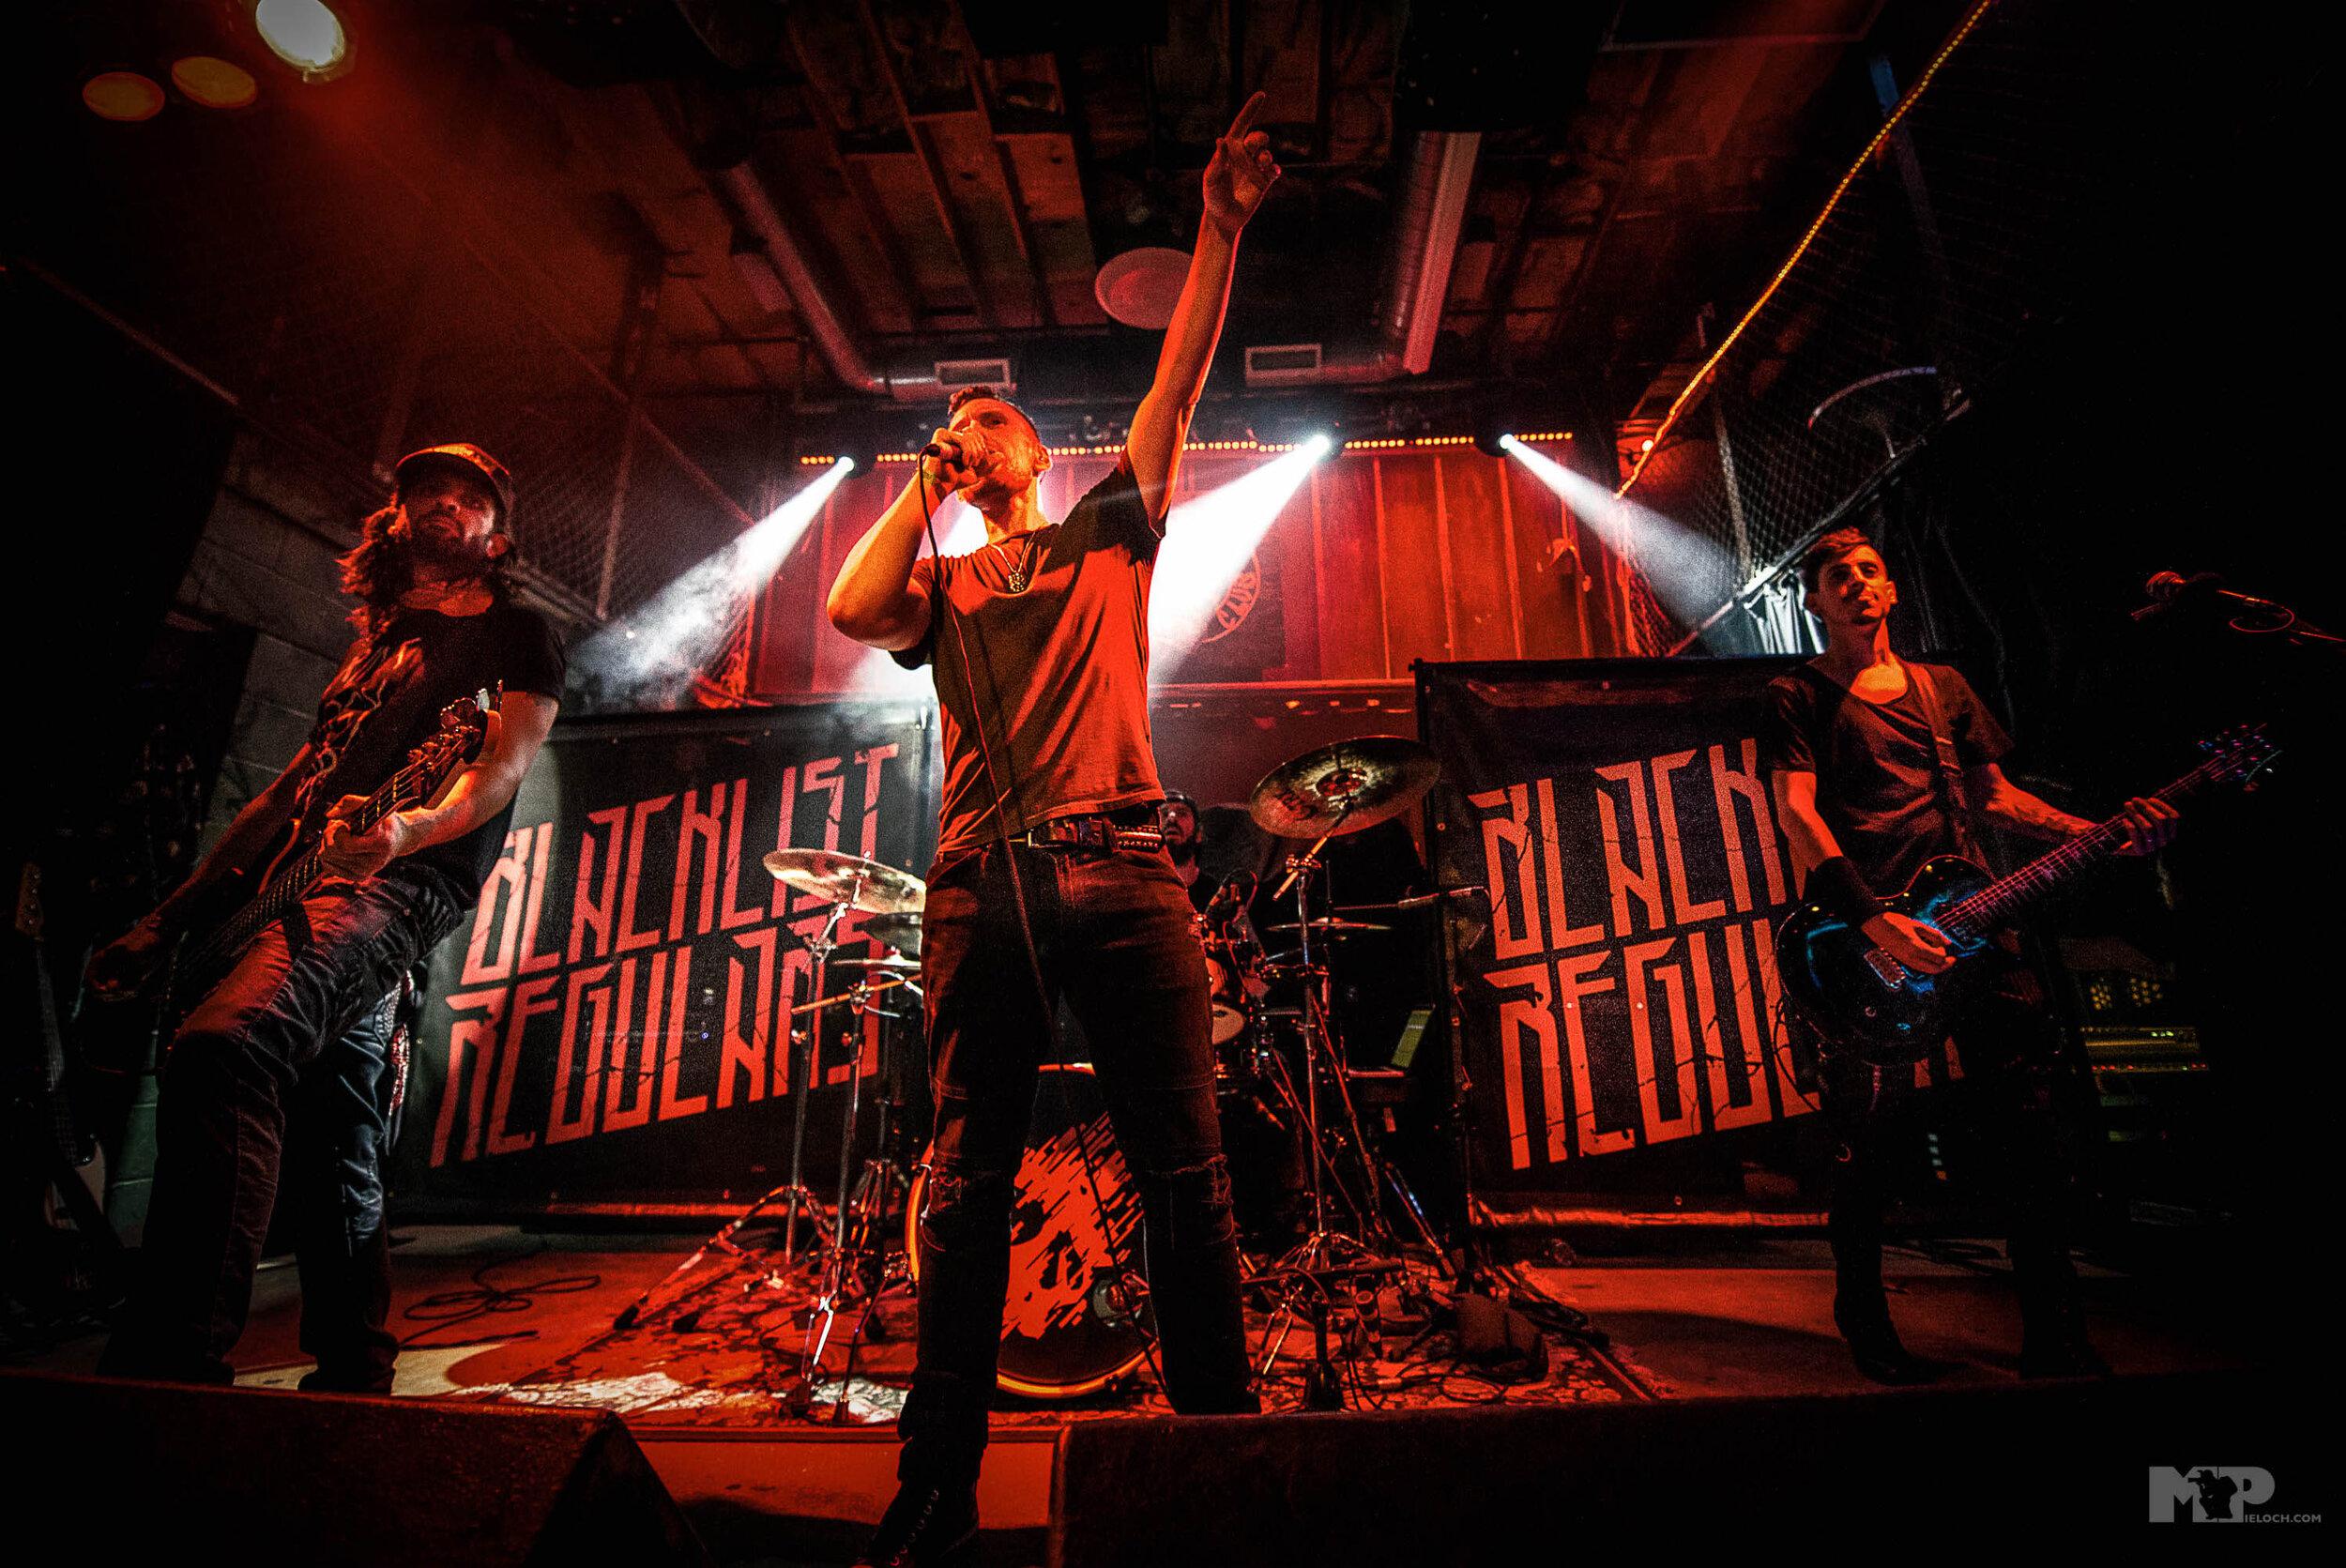 Blacklist Regulars live at Reggies Rock Club. Direct support for Meytal.